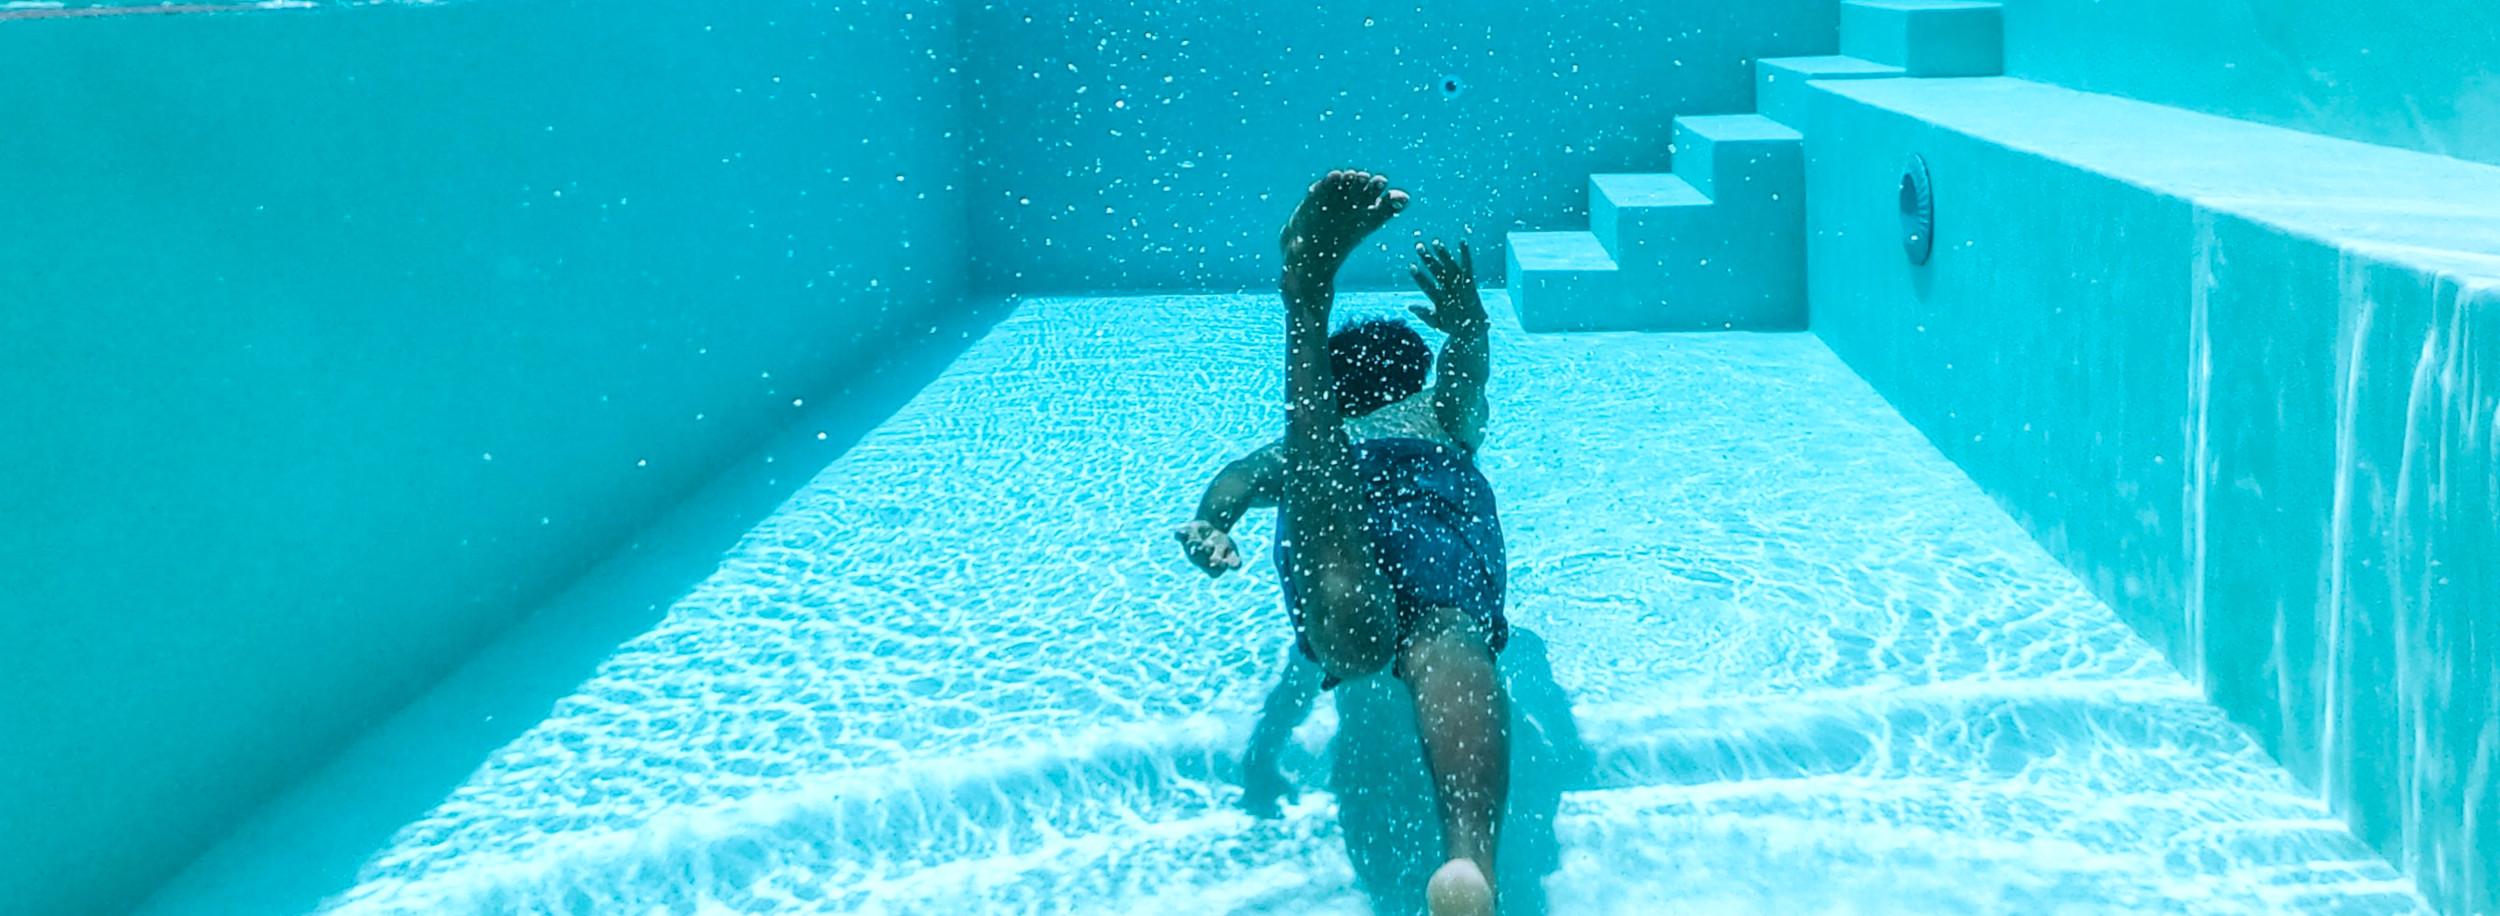 vips pool service